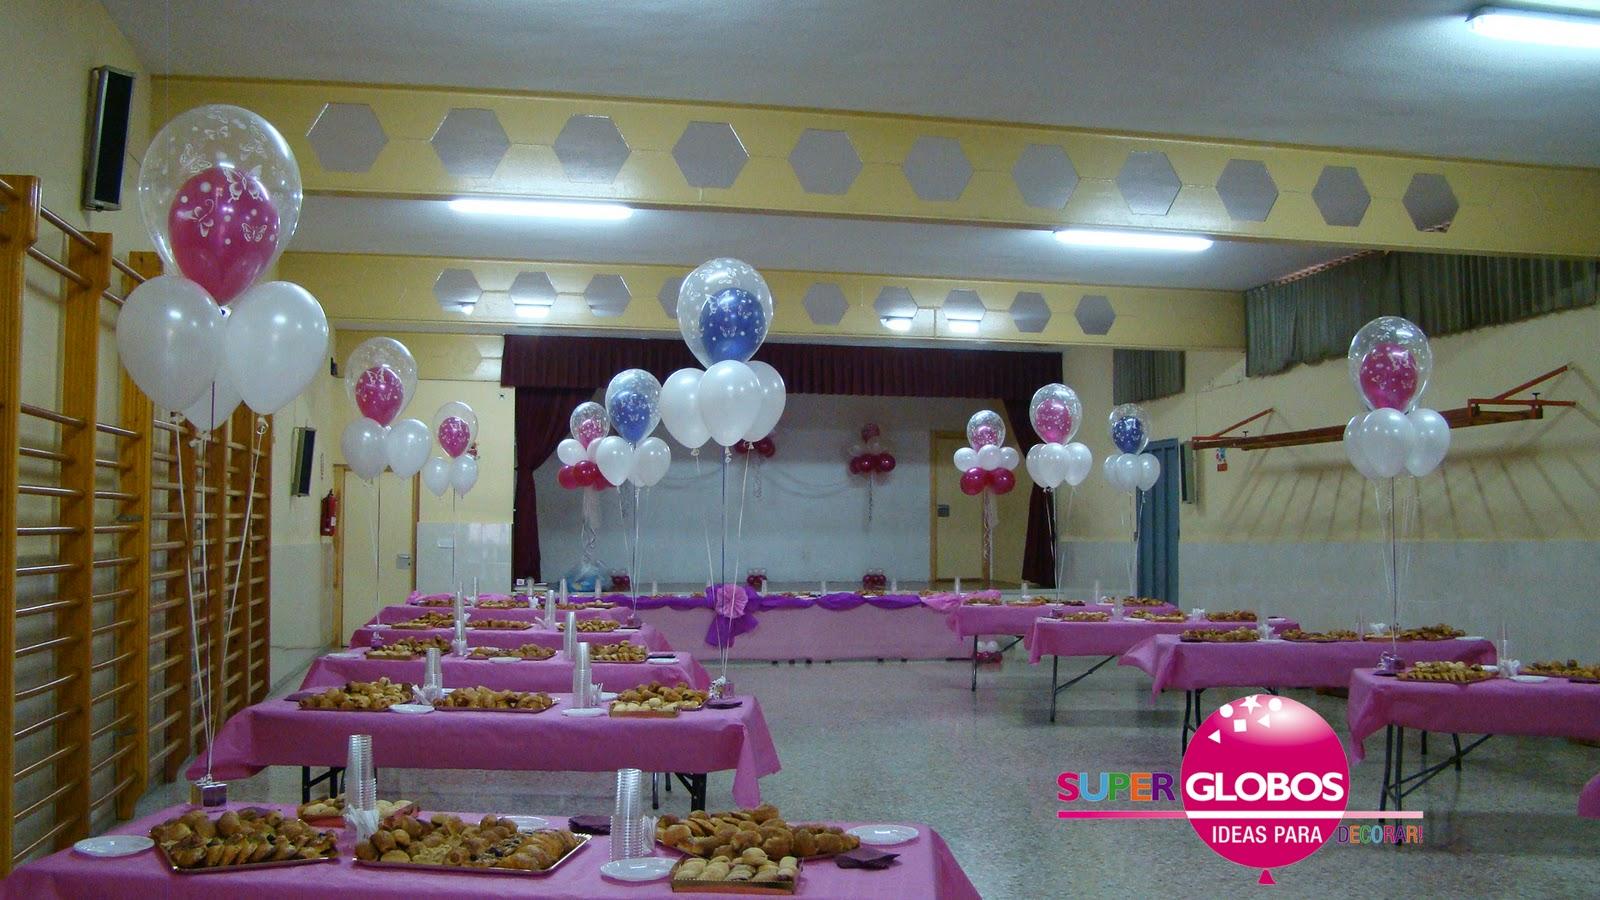 Decoraciones para centros de mesa para eventos car for Decoraciones para decorar